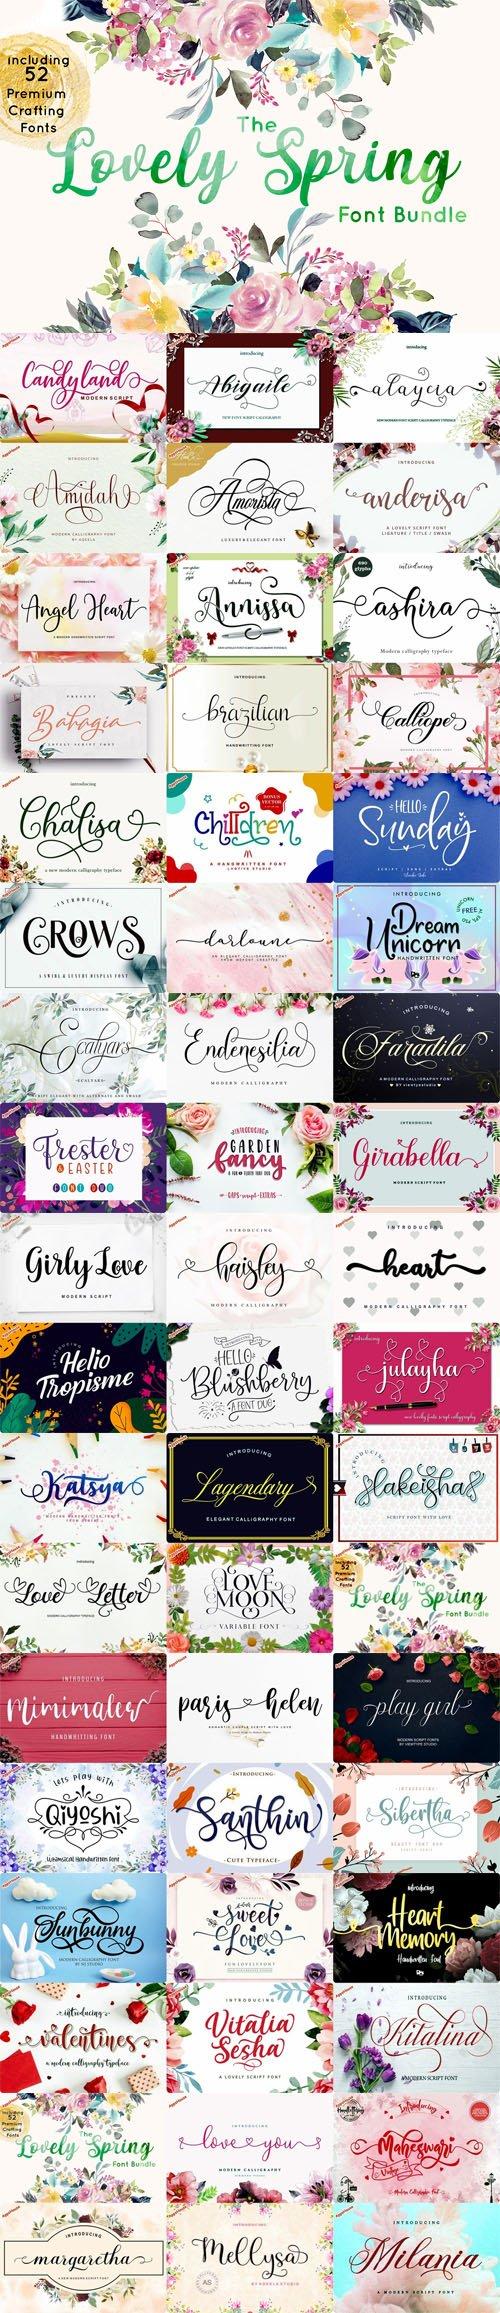 The Lovely Spring Font Bundle - Including 52 Premium Crafting Fonts